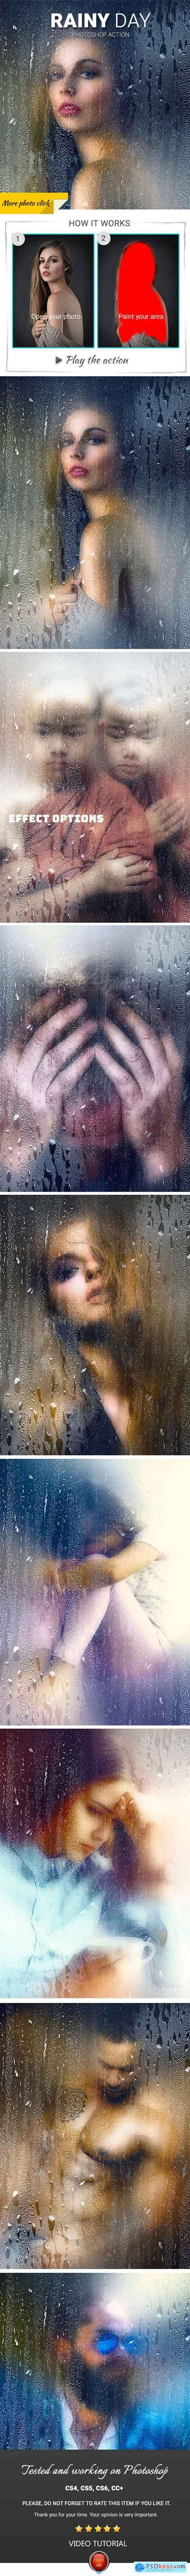 Rainy Day Photoshop Action 22558924